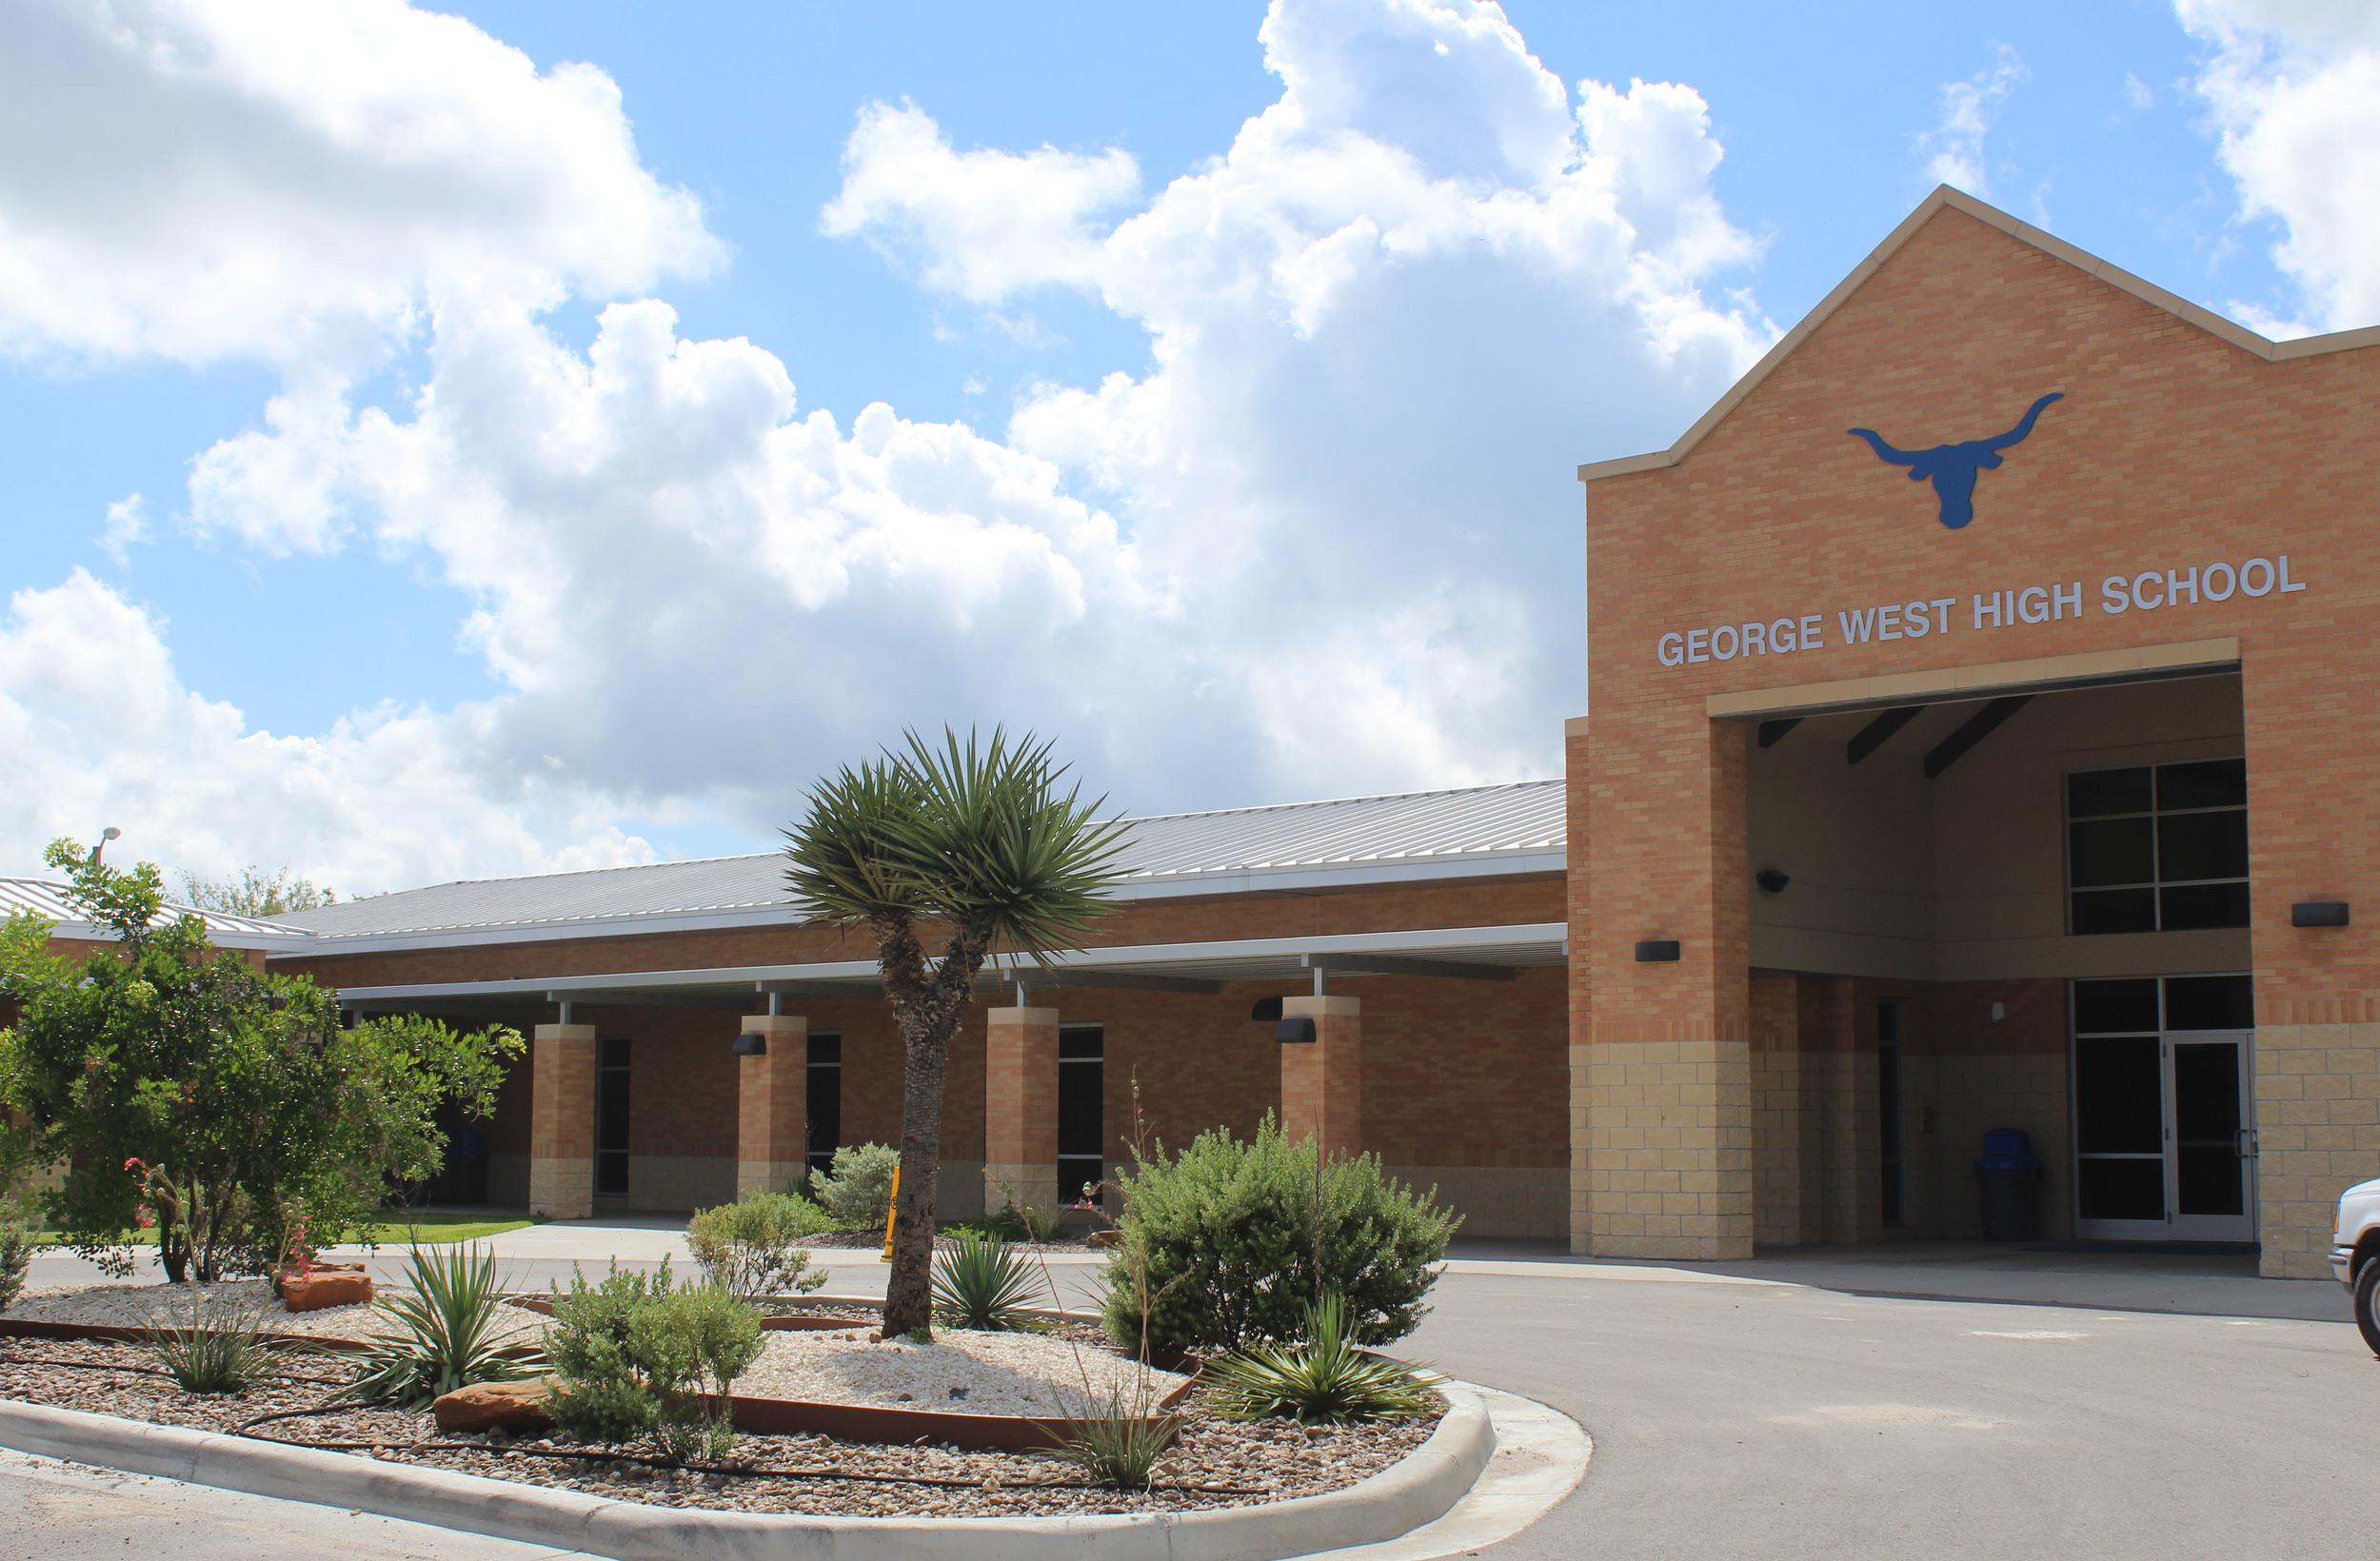 George West High School